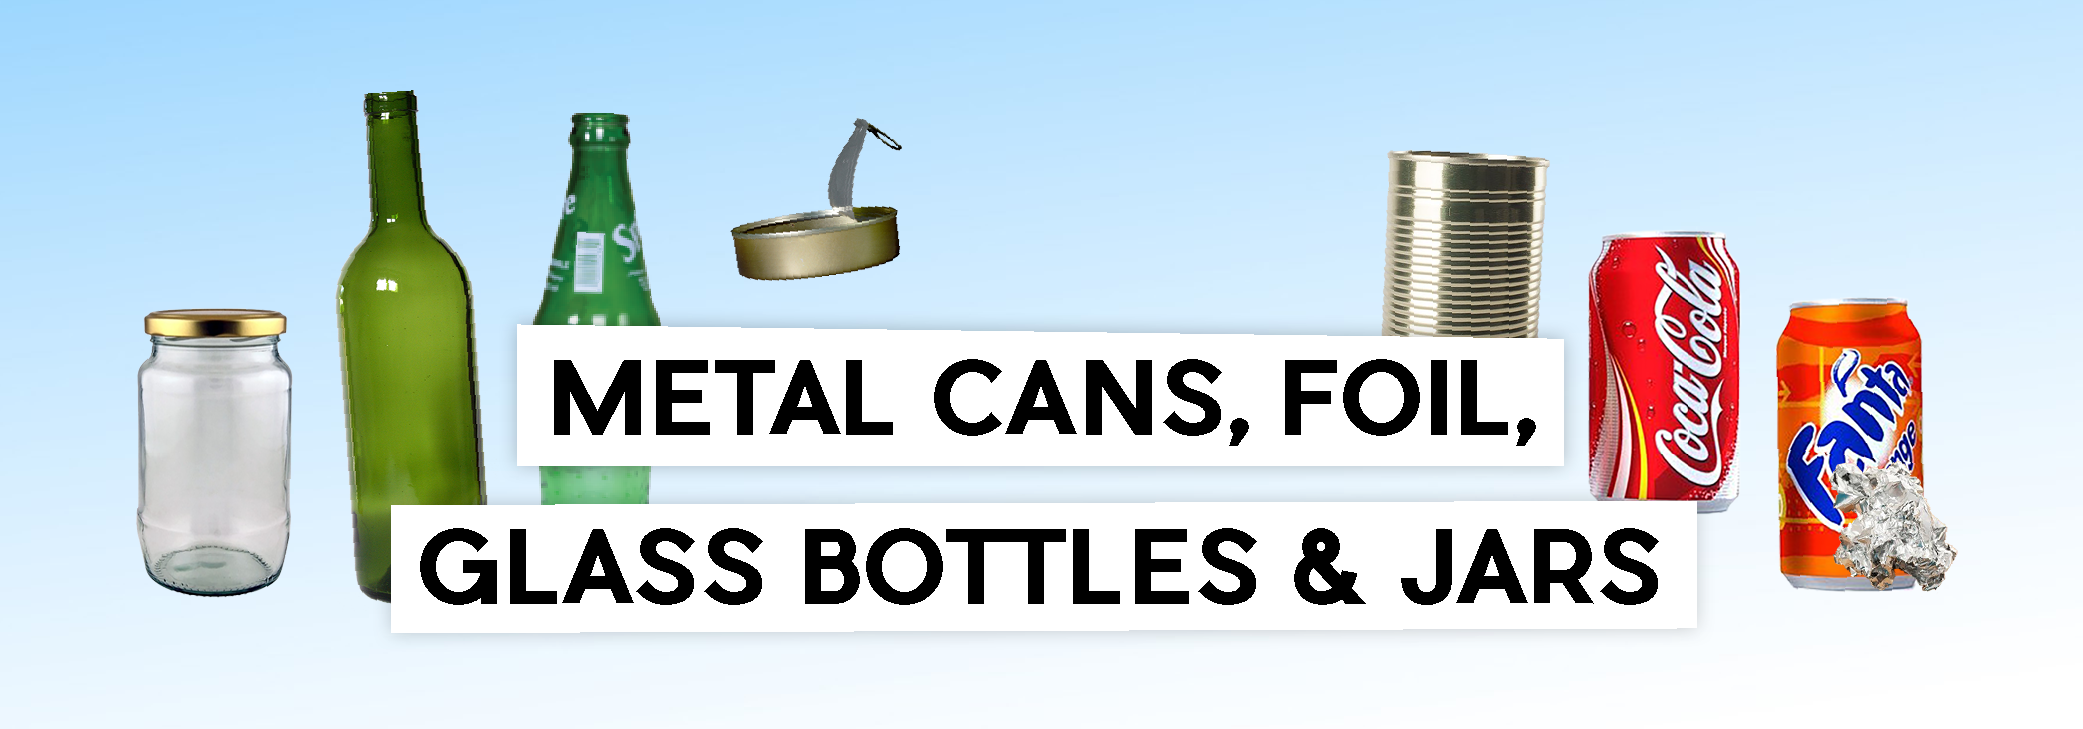 METAL & GLASS link